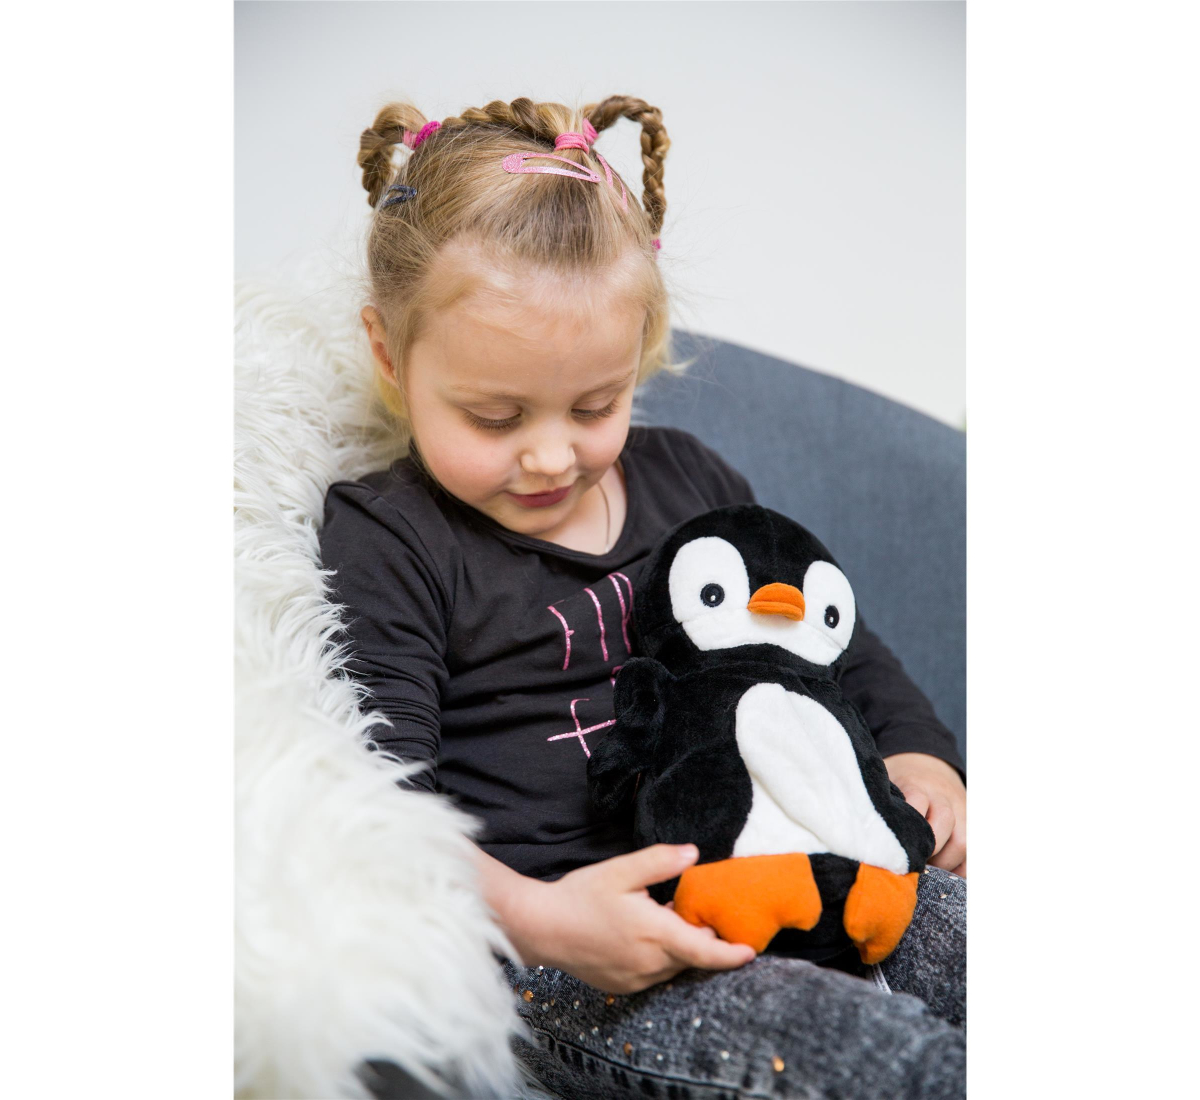 Habibi Plush : Midi Pinguin mit herausnehmbarem...